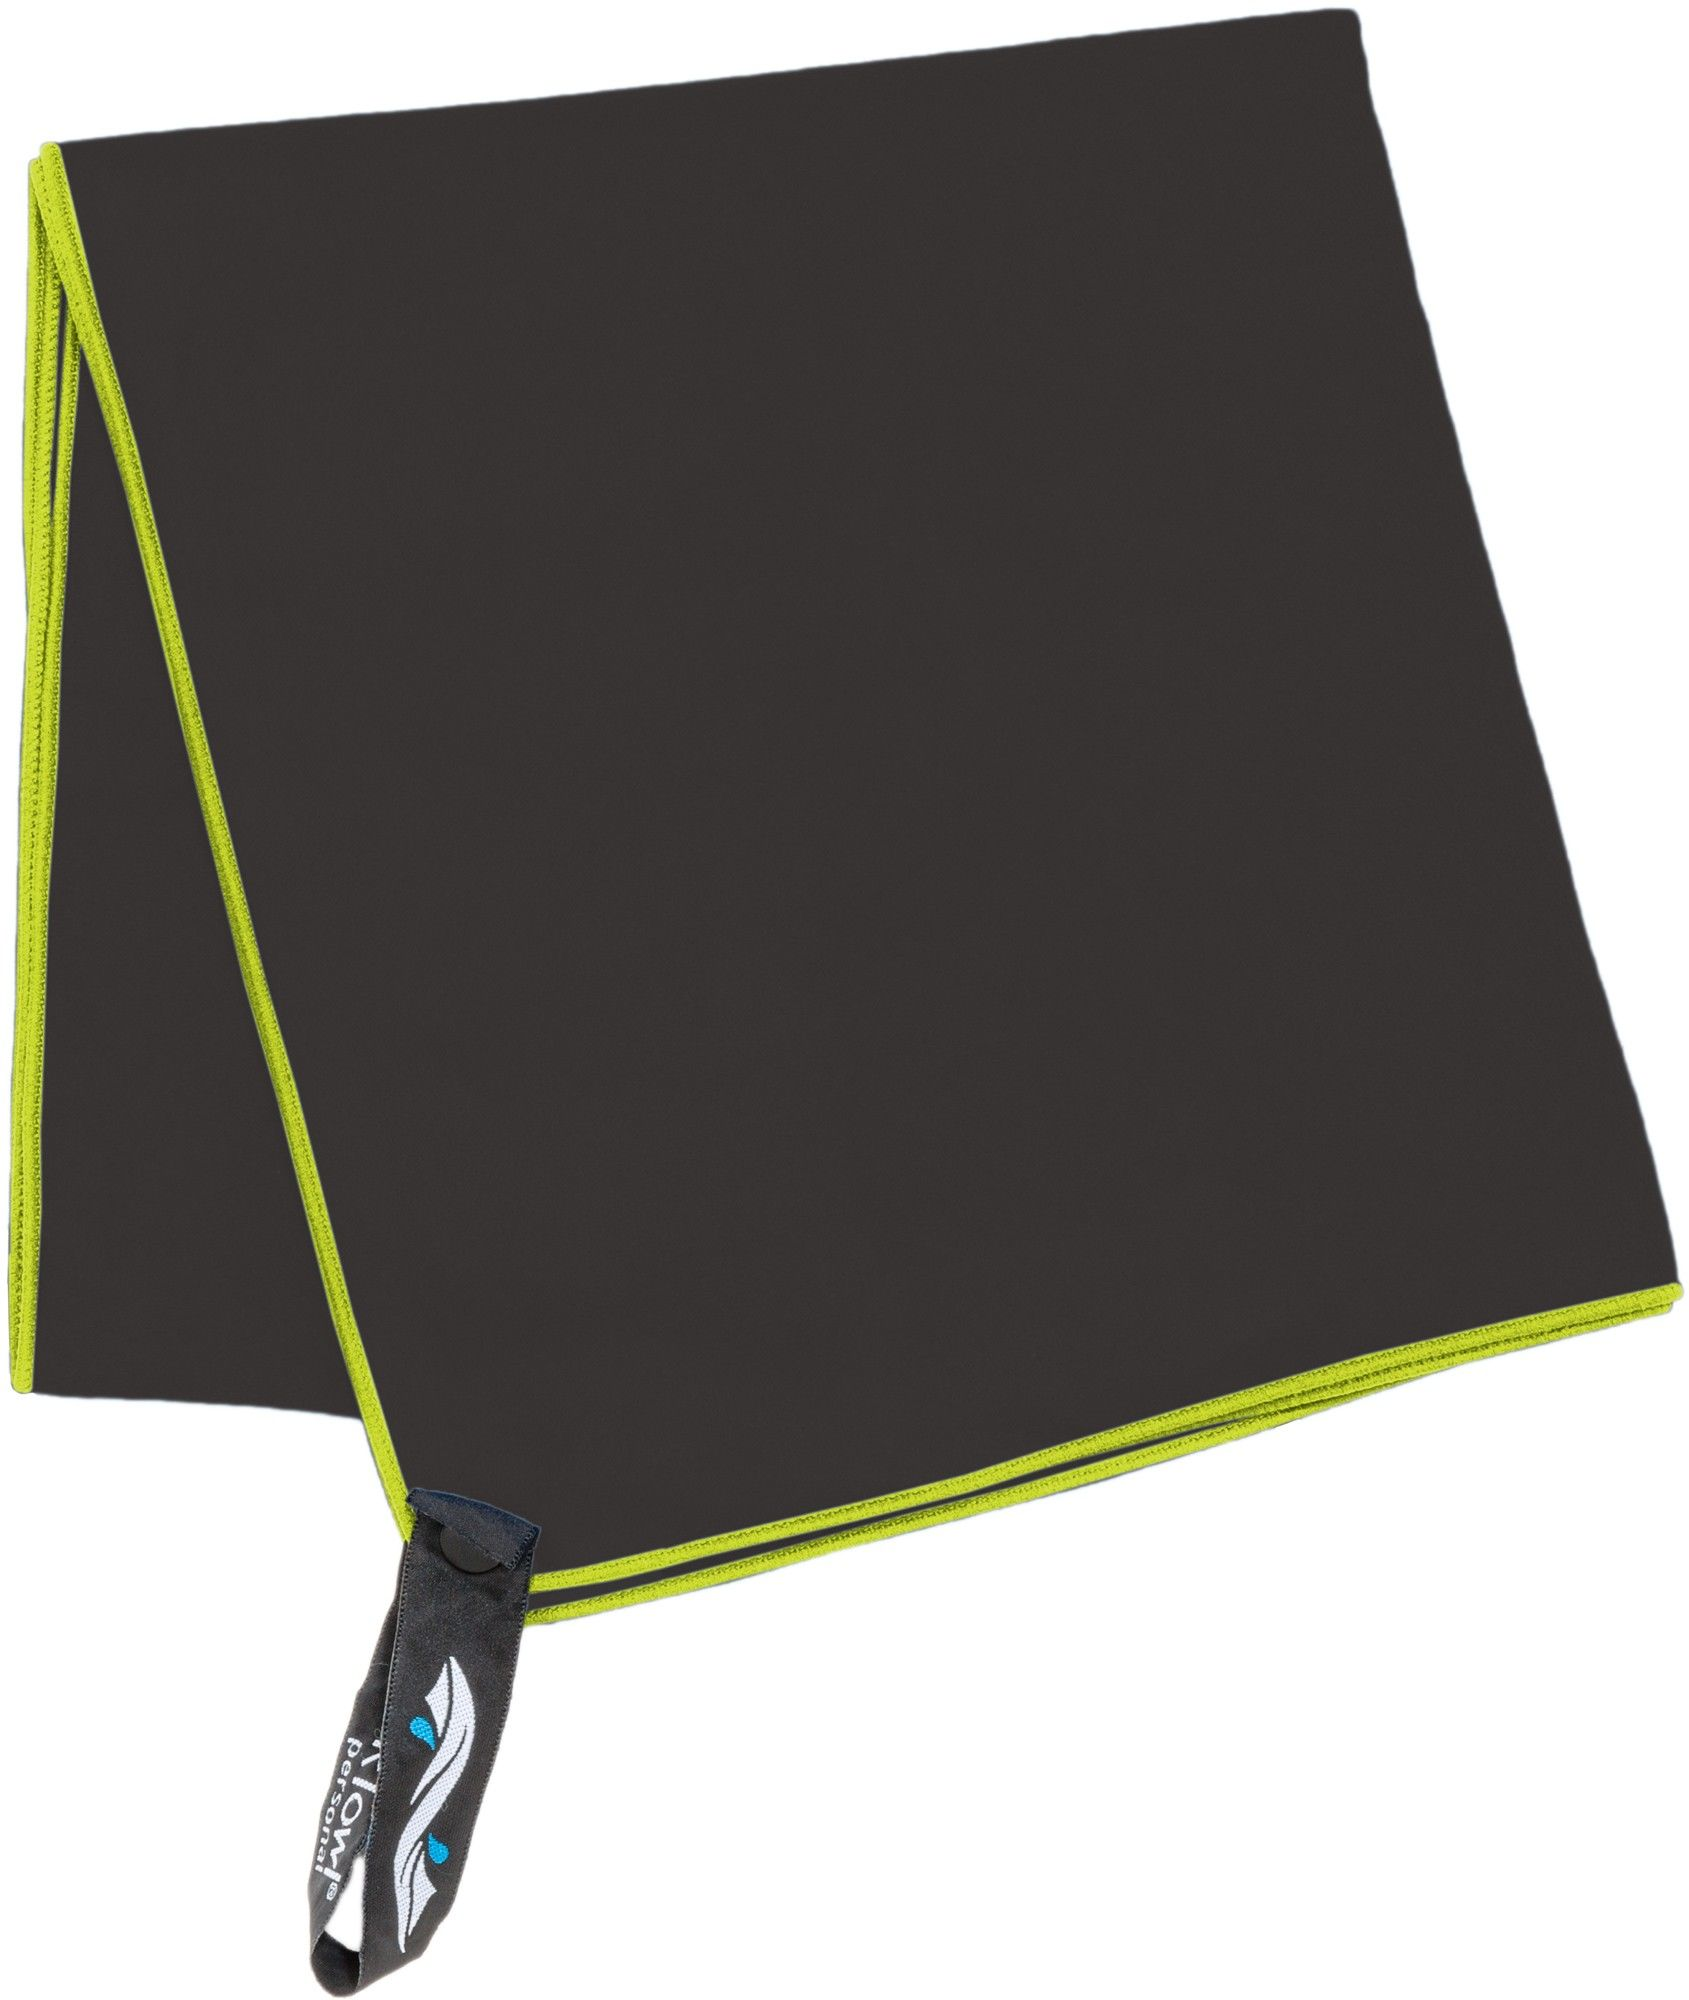 PackTowl Personal XL-Körper Schwarz, Outdoor-Hygiene, One Size